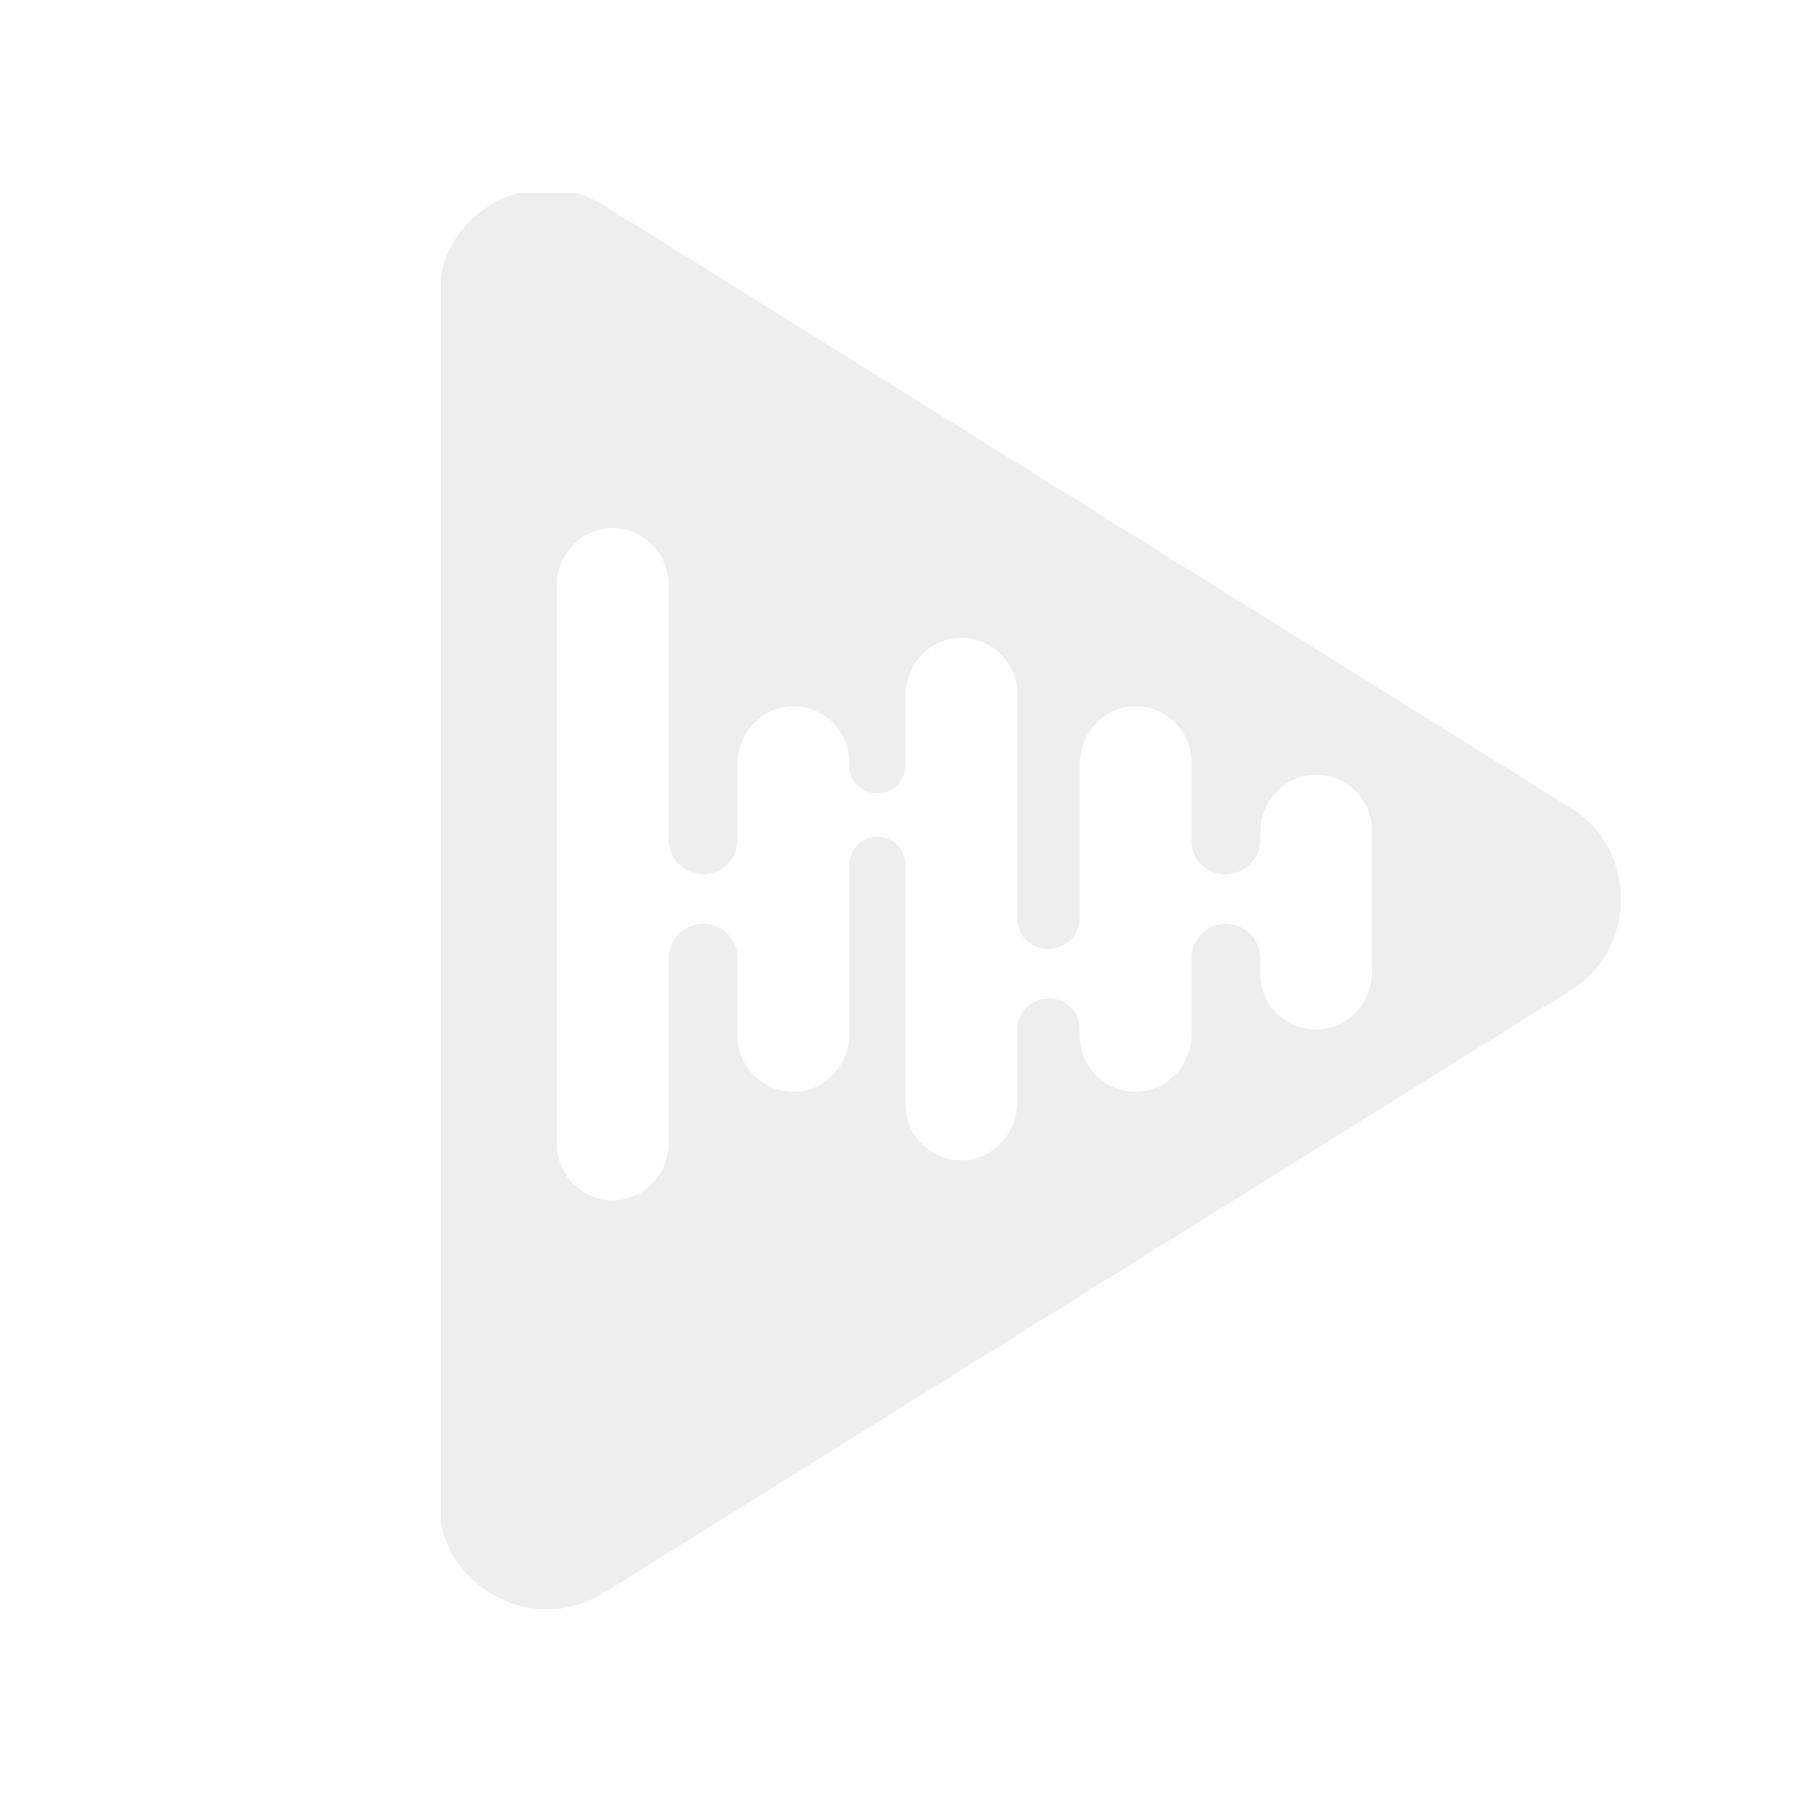 Skoddejuice Costarica Special Aroma